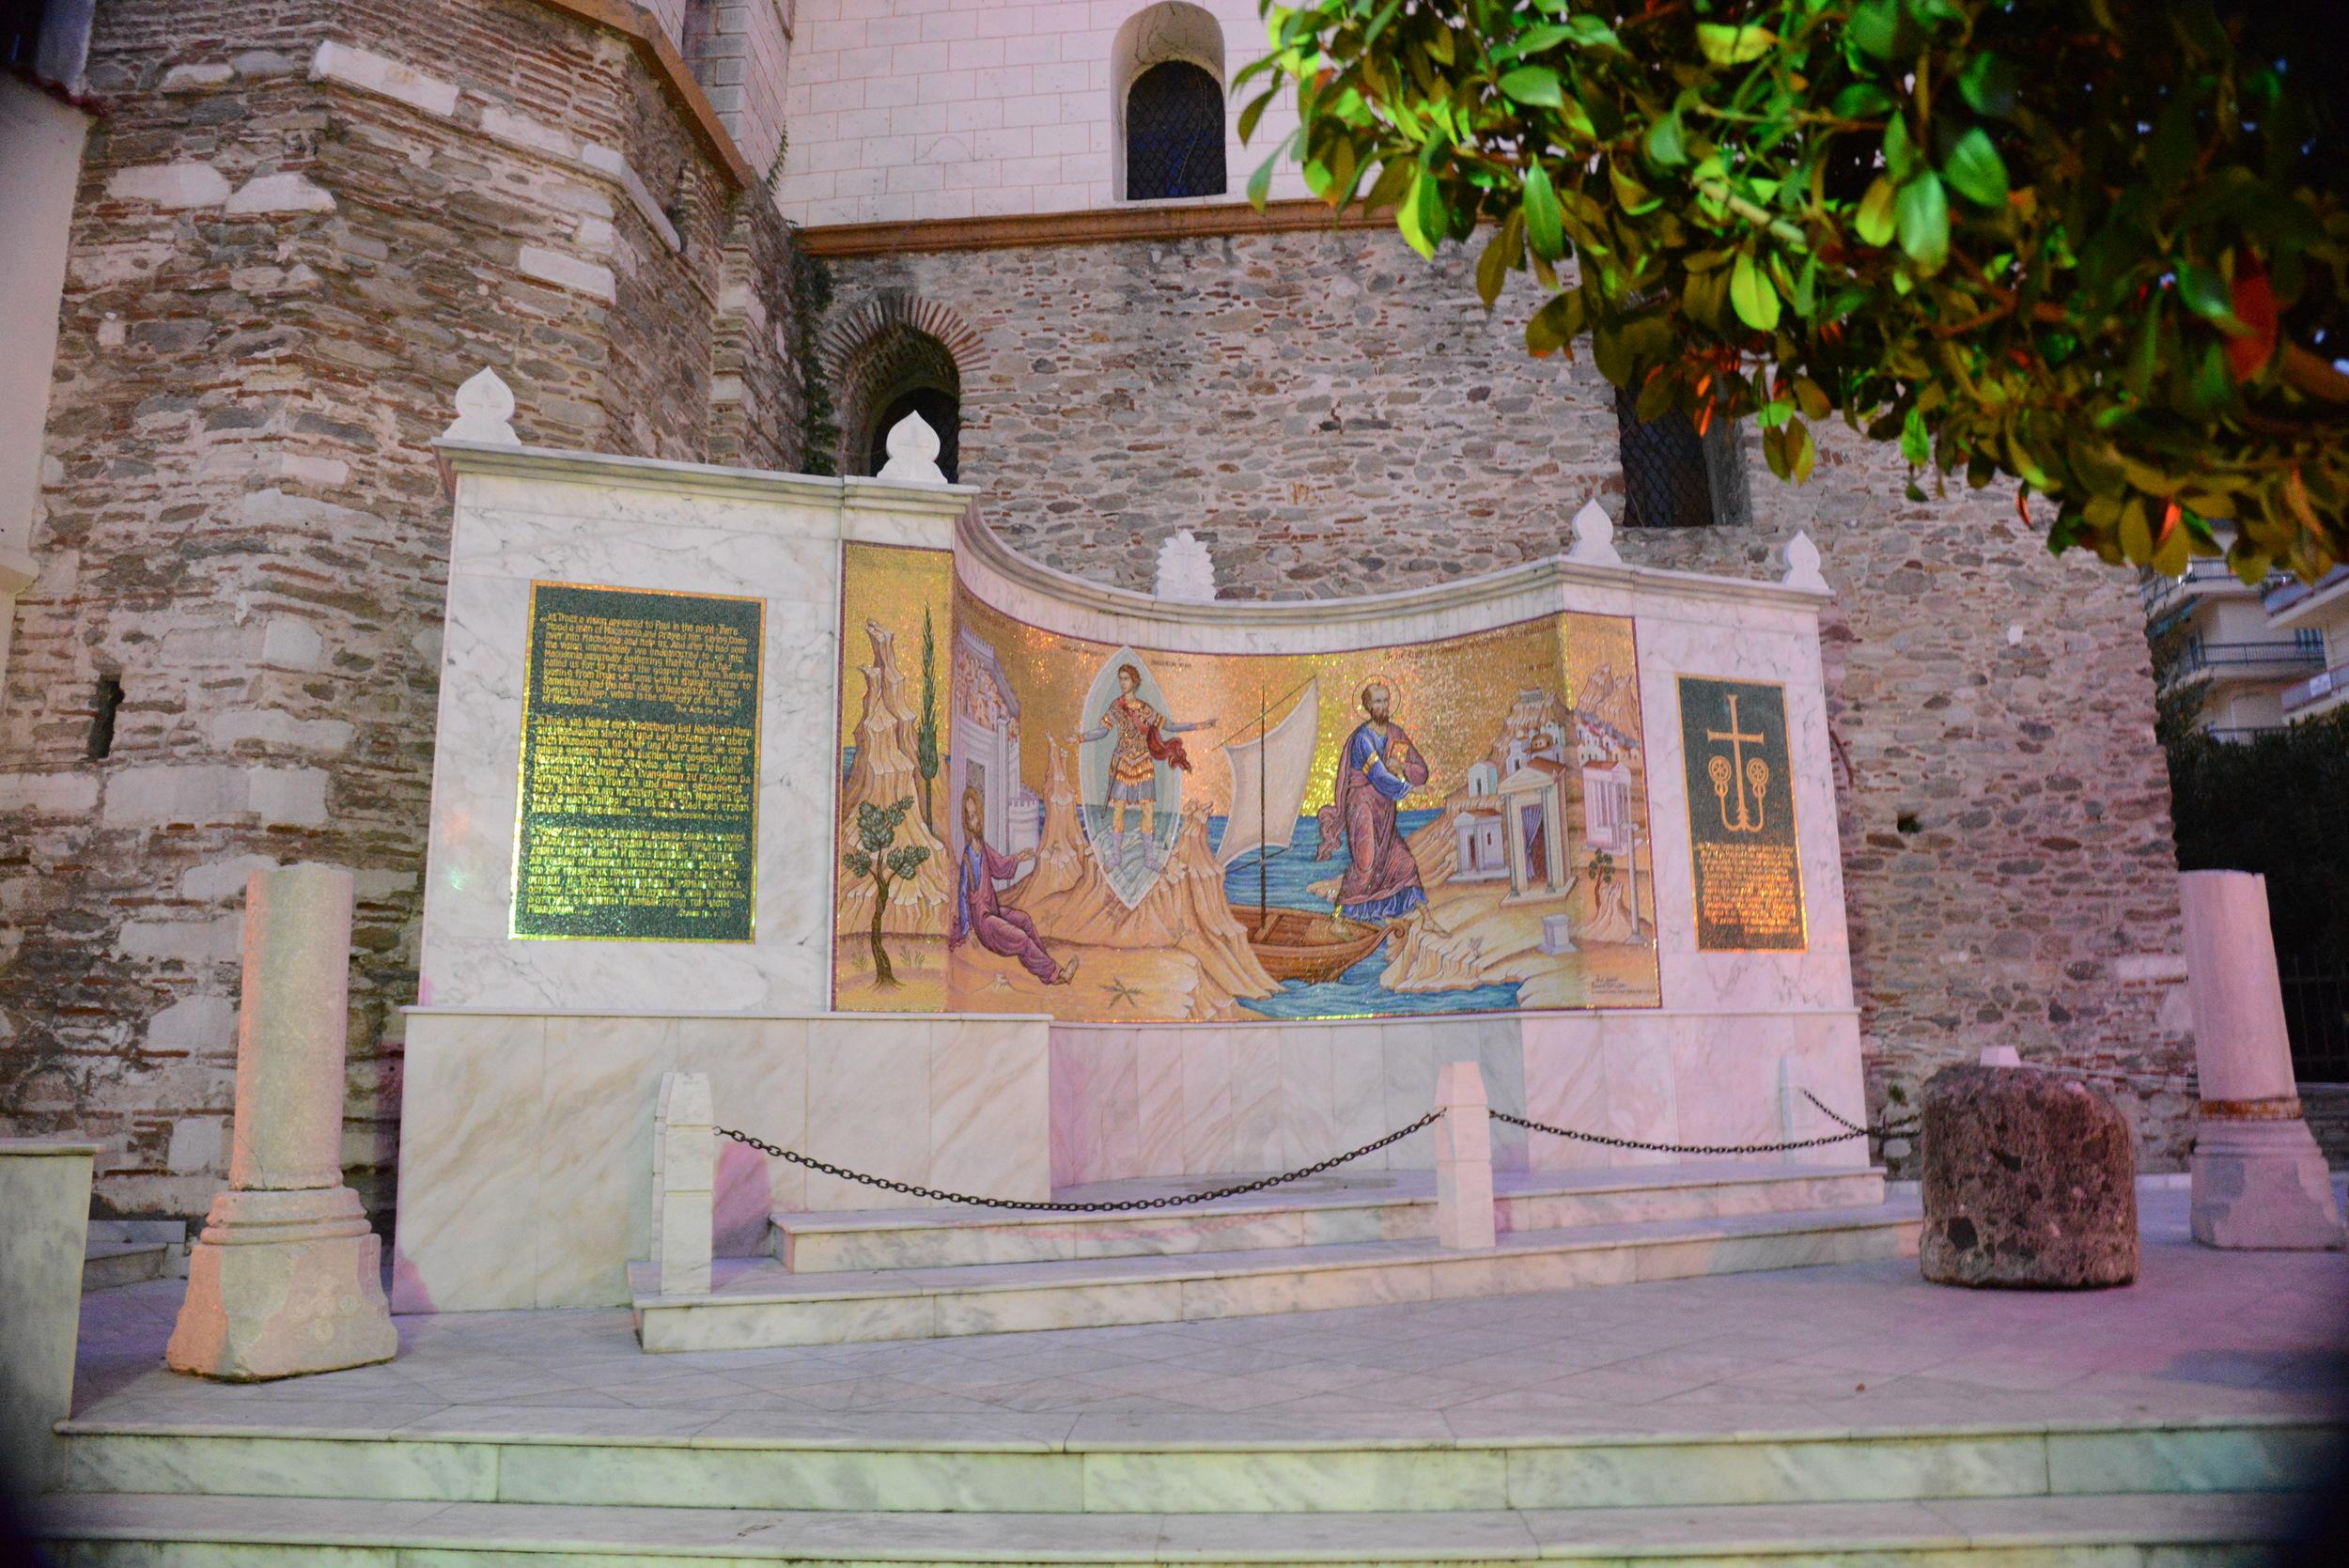 St. Paul Square, St. Nicholas Church, Kavala, Greece (2014)